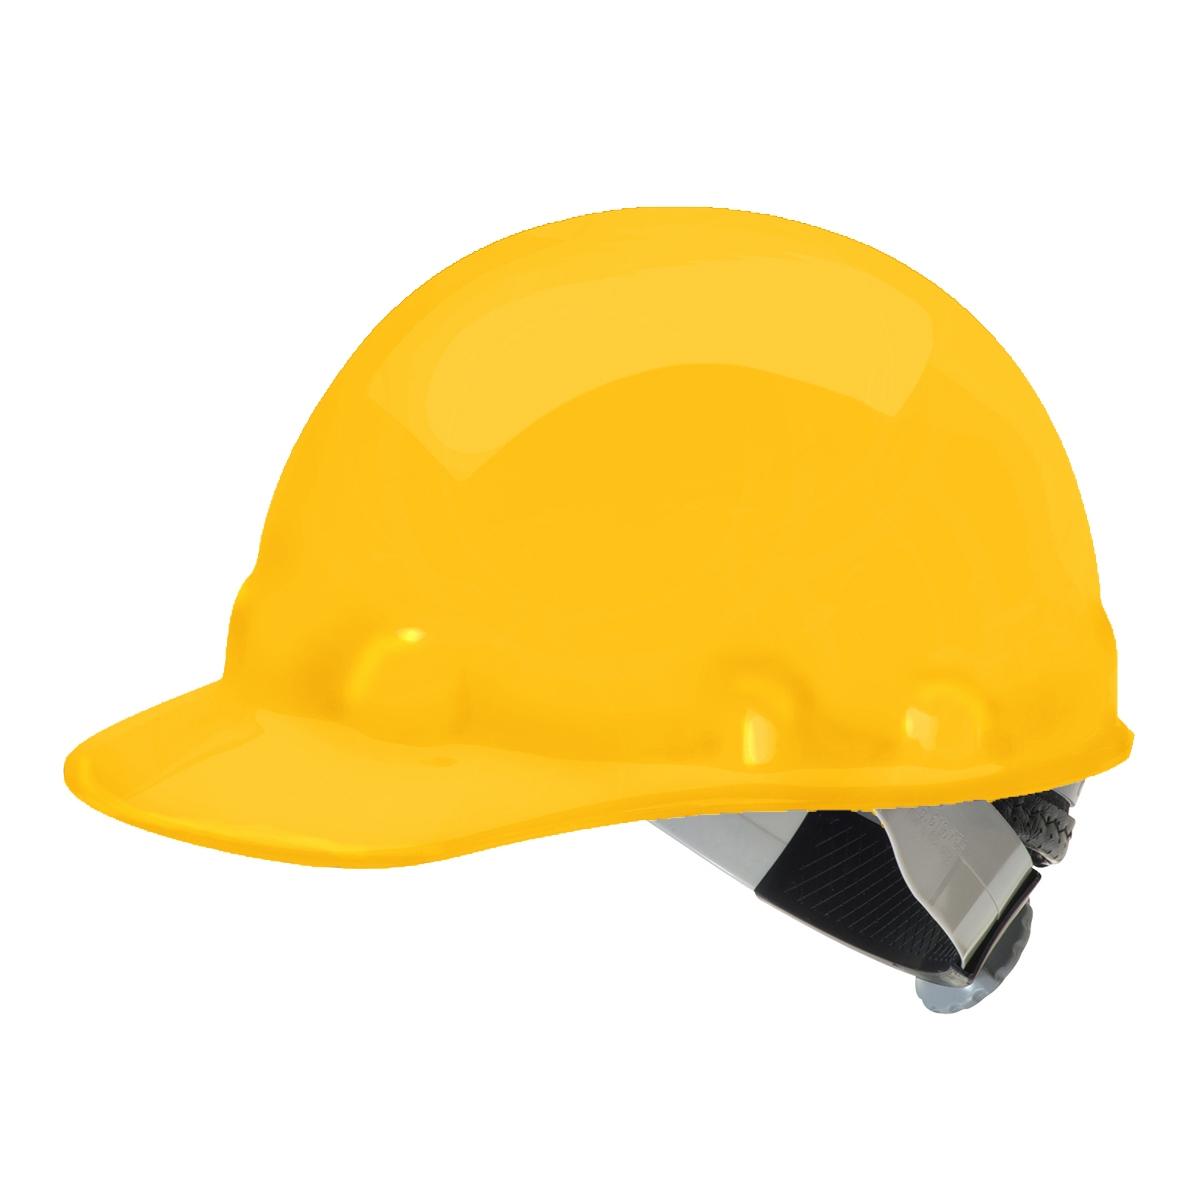 Fibre Metal E2SW Hard Hat - SwingStrap Suspension - Yellow : FullSource.com